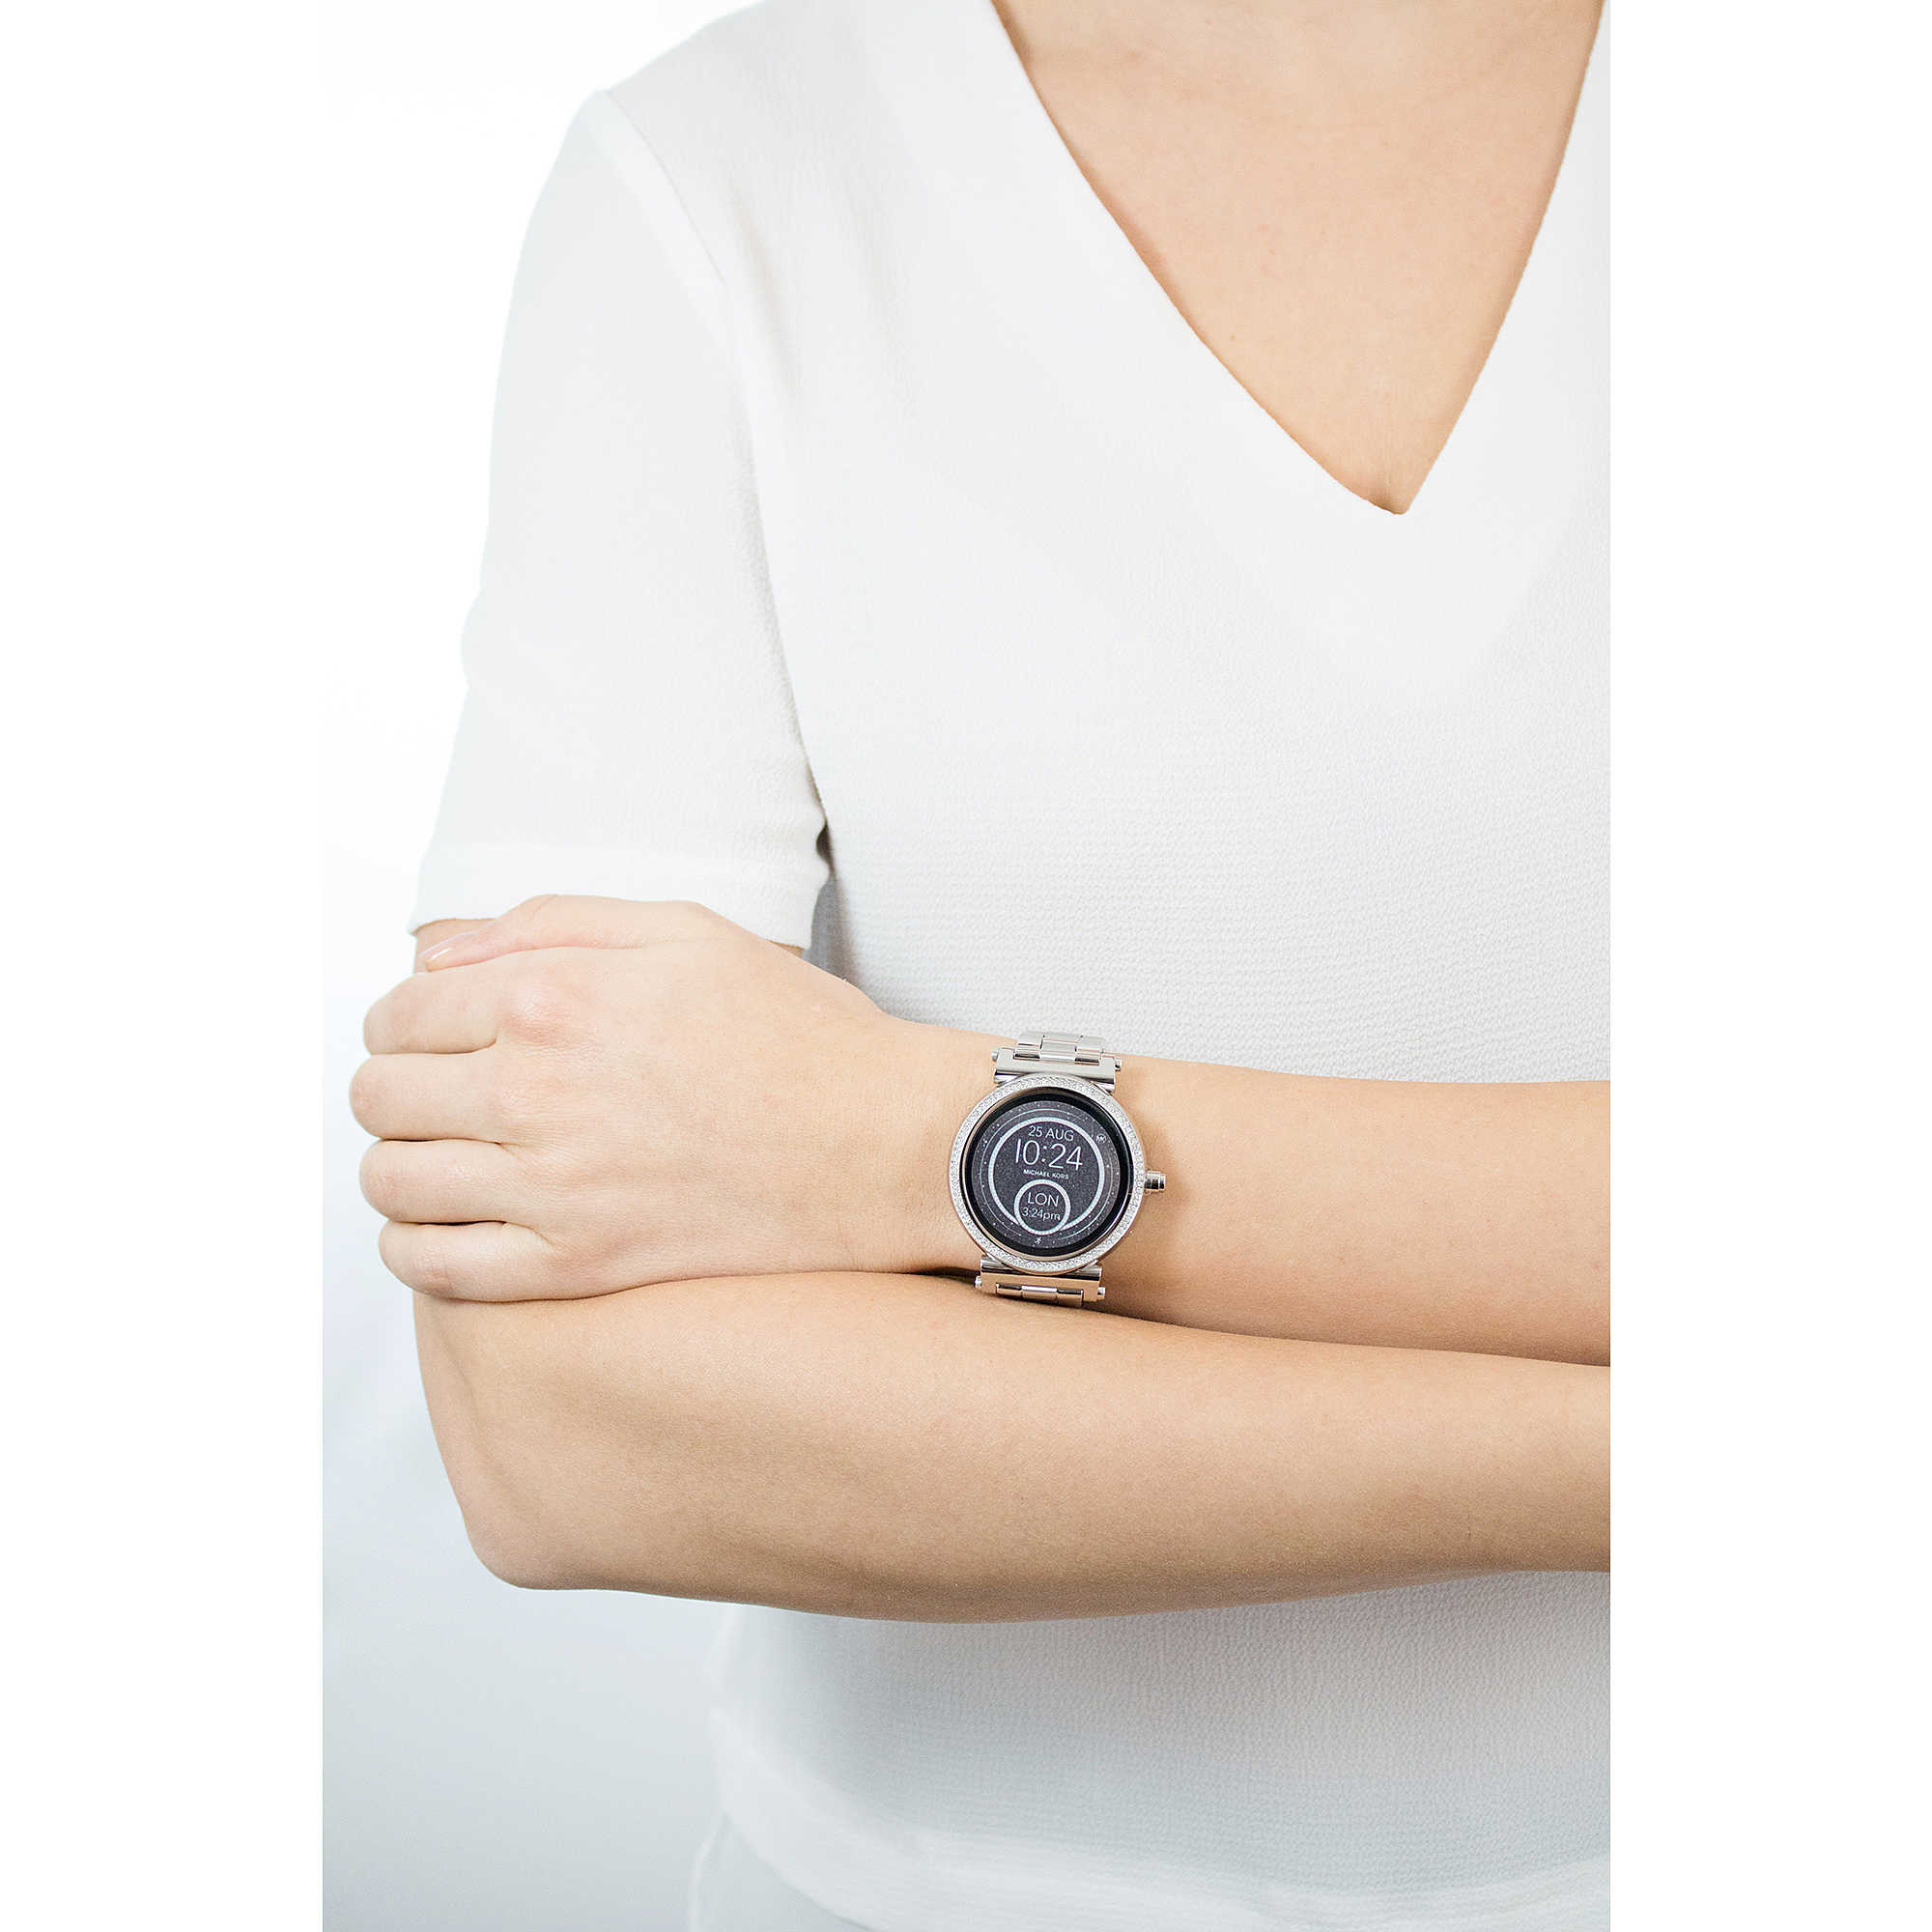 uhr smartwatch frau michael kors sofie mkt5020 smartwatches michael kors. Black Bedroom Furniture Sets. Home Design Ideas